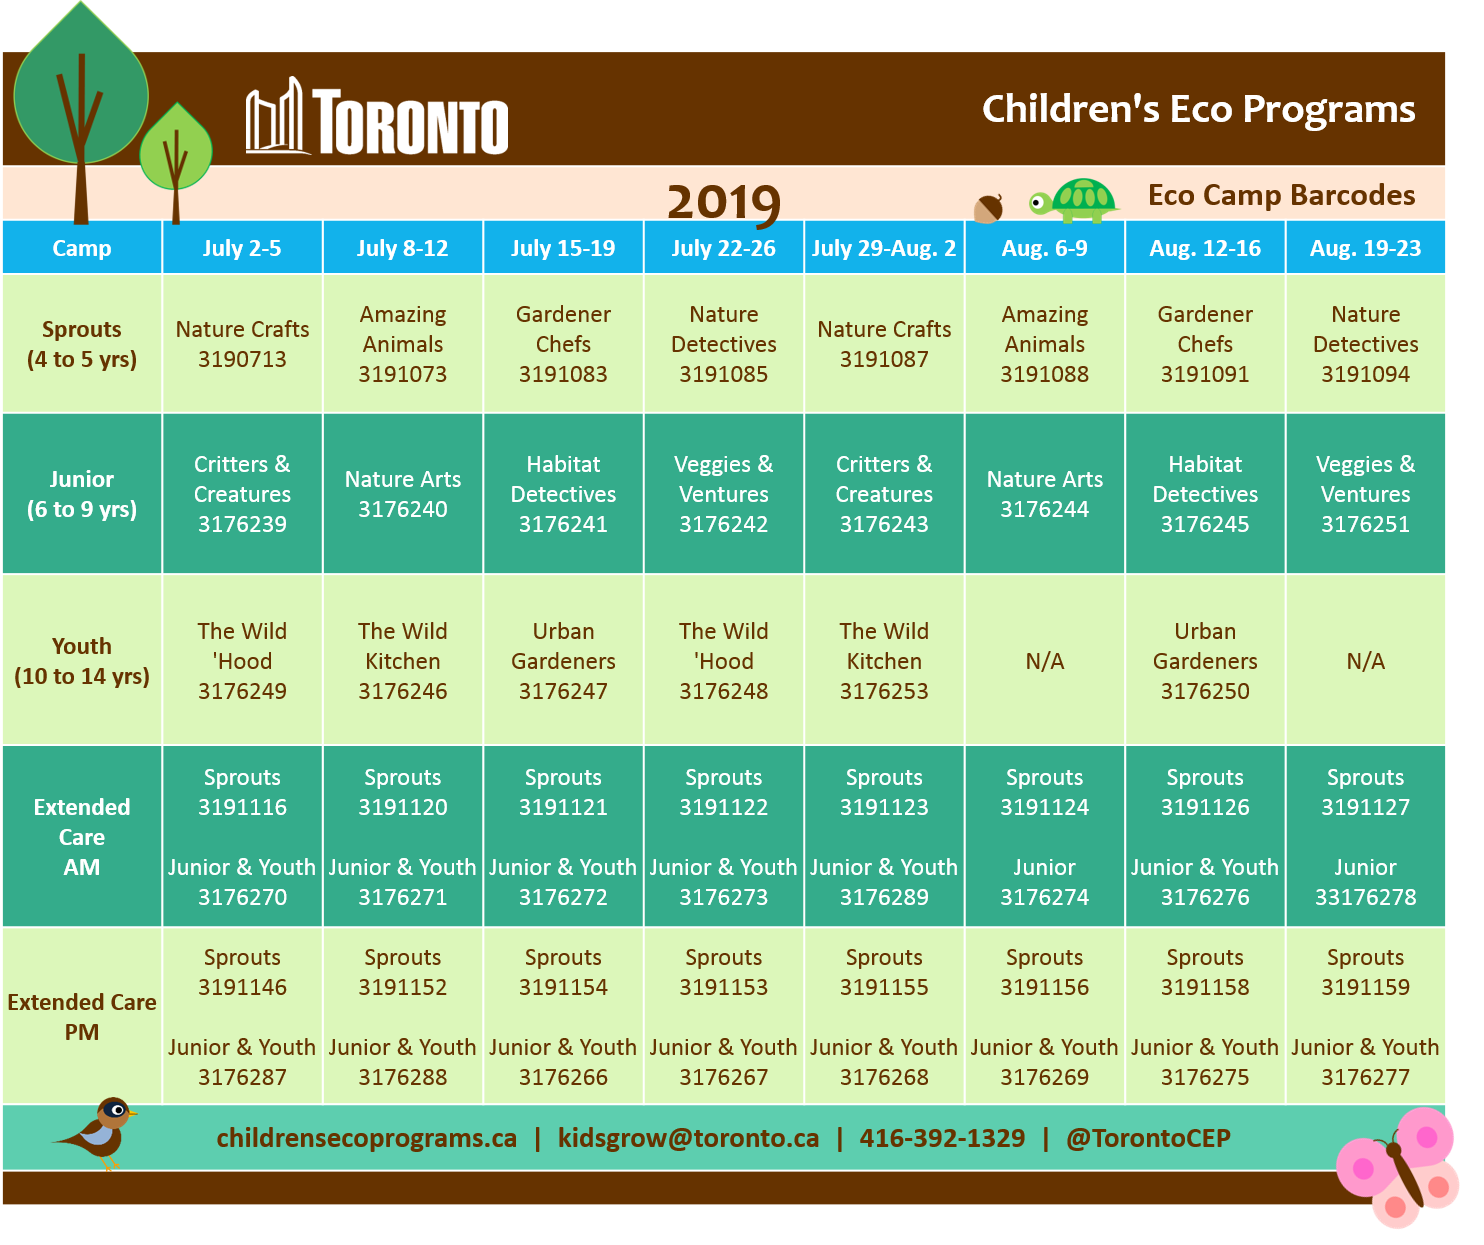 Eco Camp Barcodes 2019